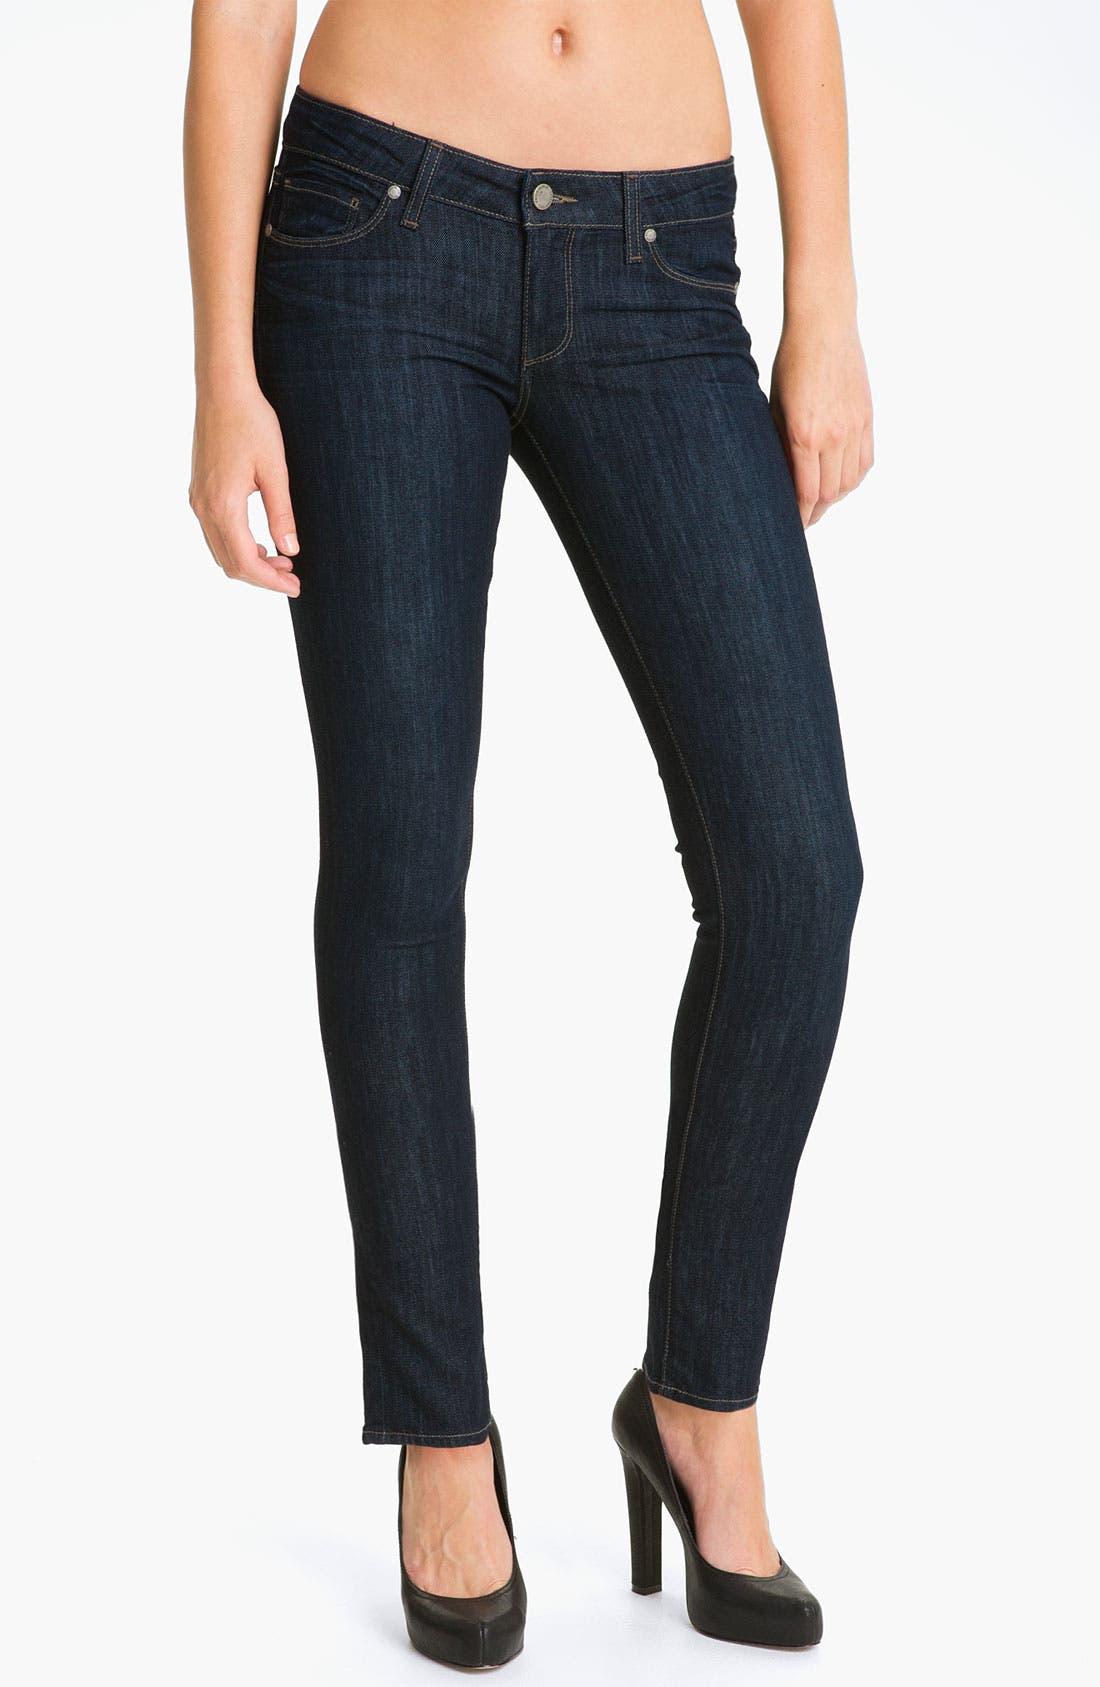 Alternate Image 1 Selected - Paige Denim 'Skyline' Ankle Peg Skinny Stretch Jeans (Dream)